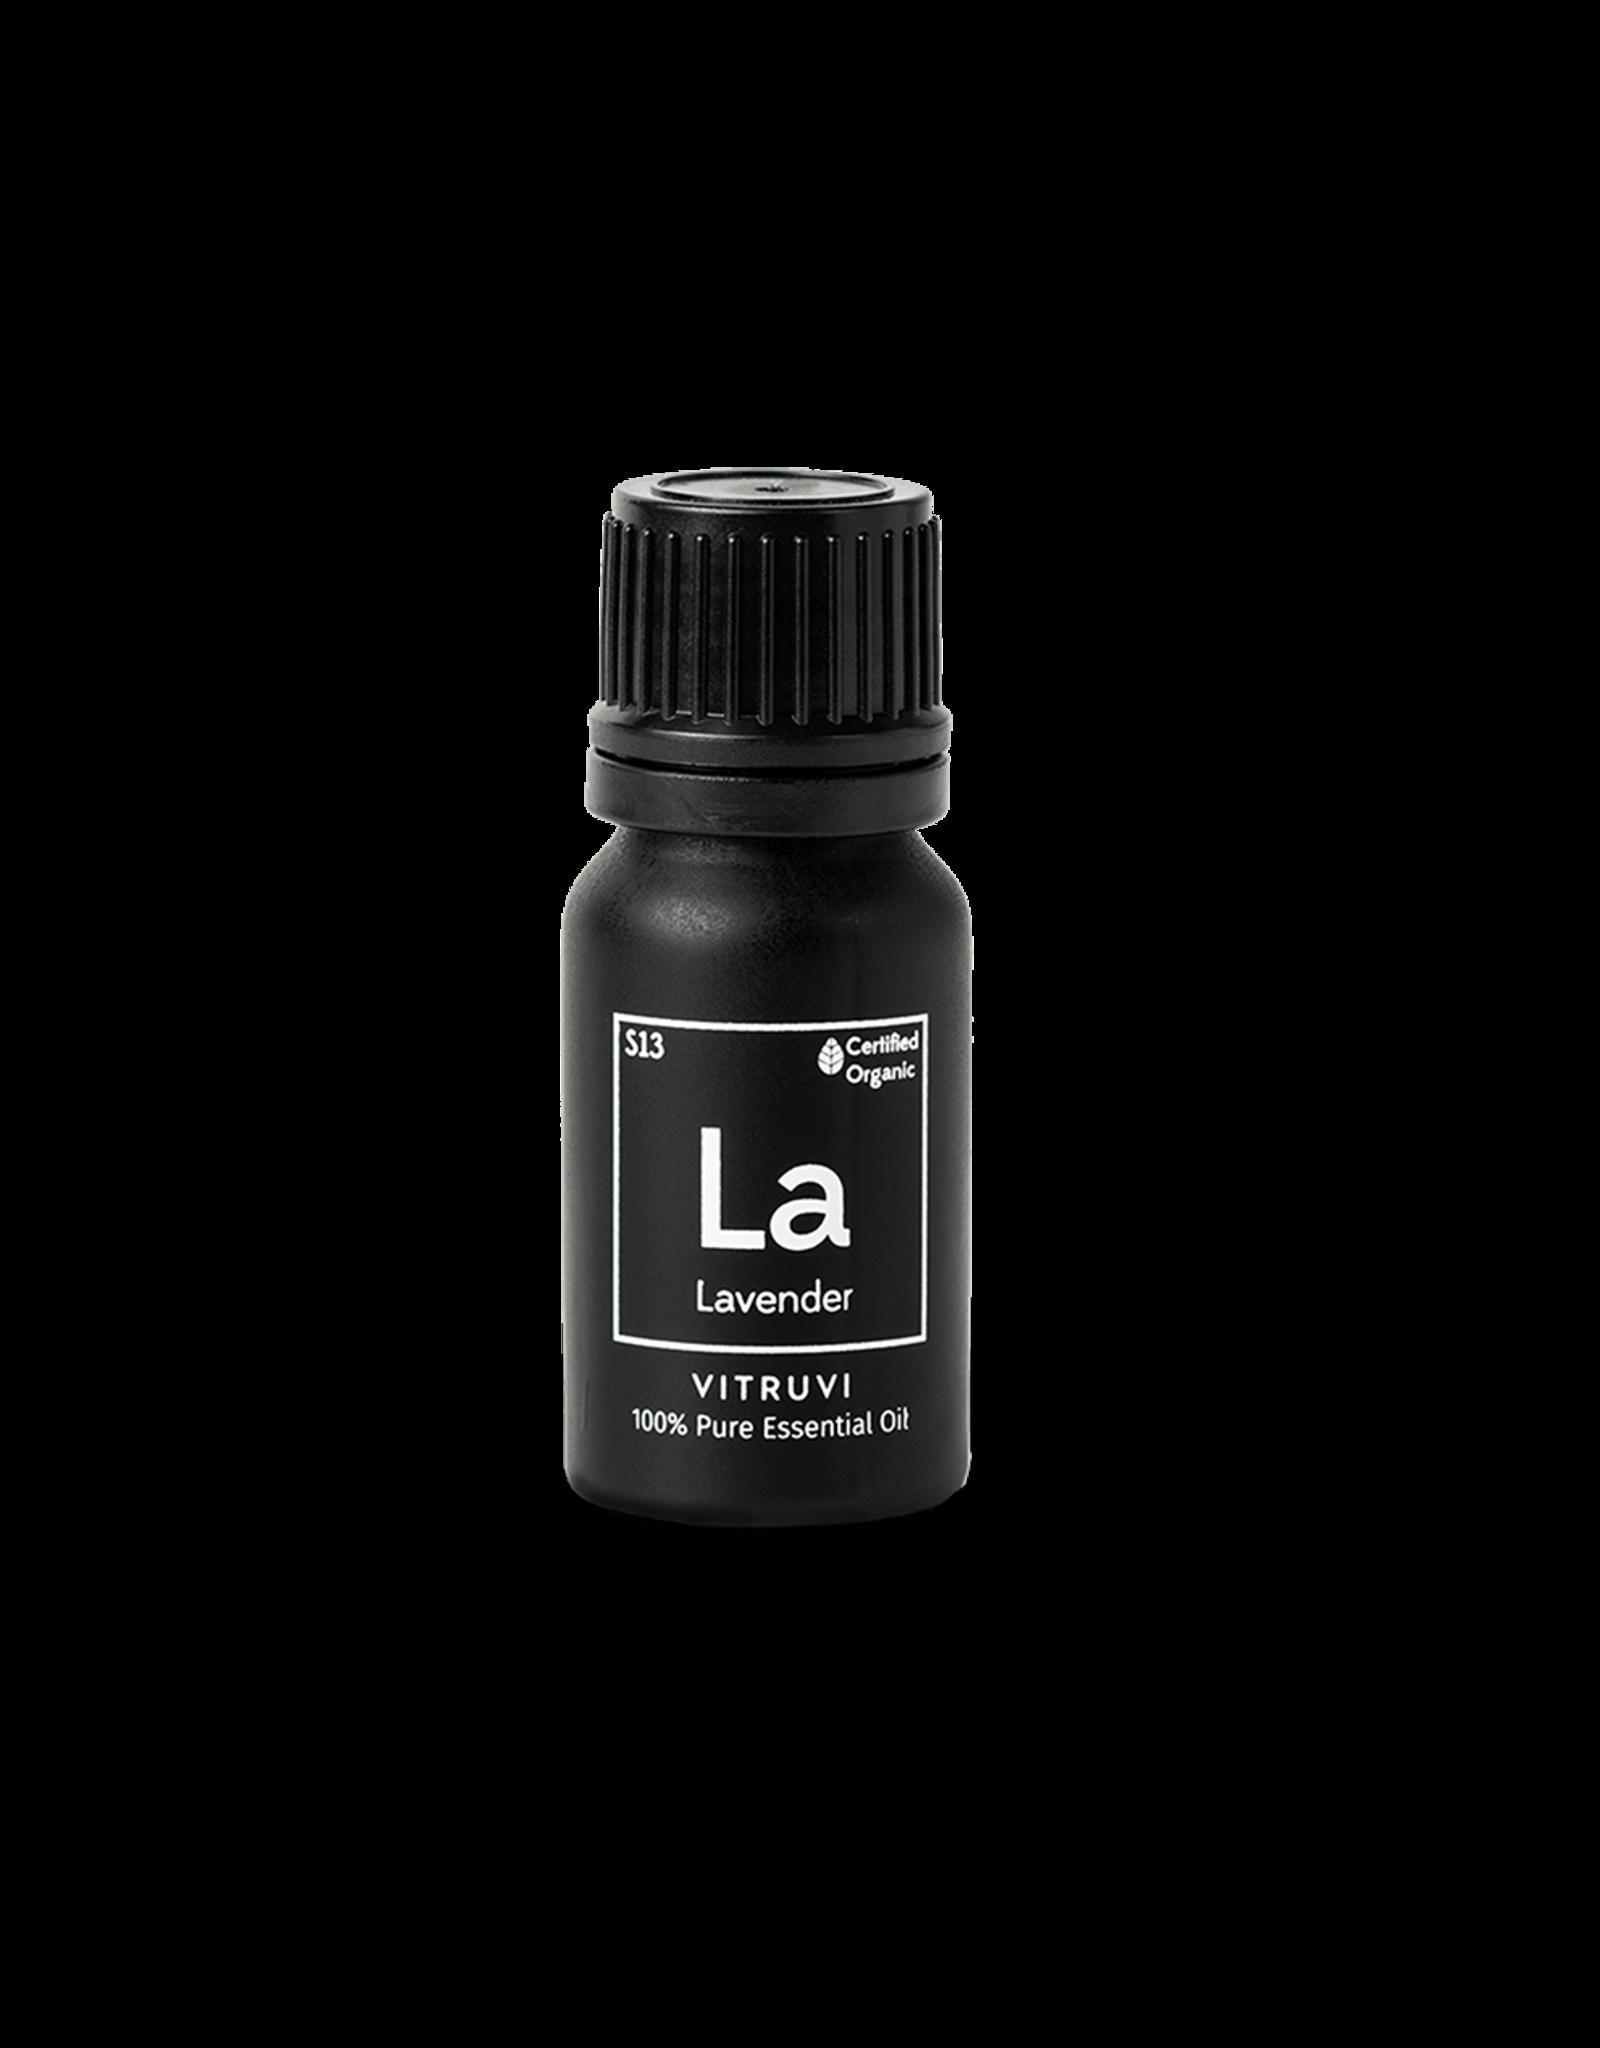 Vitruvi Vitruvi Lavender Essential Oil